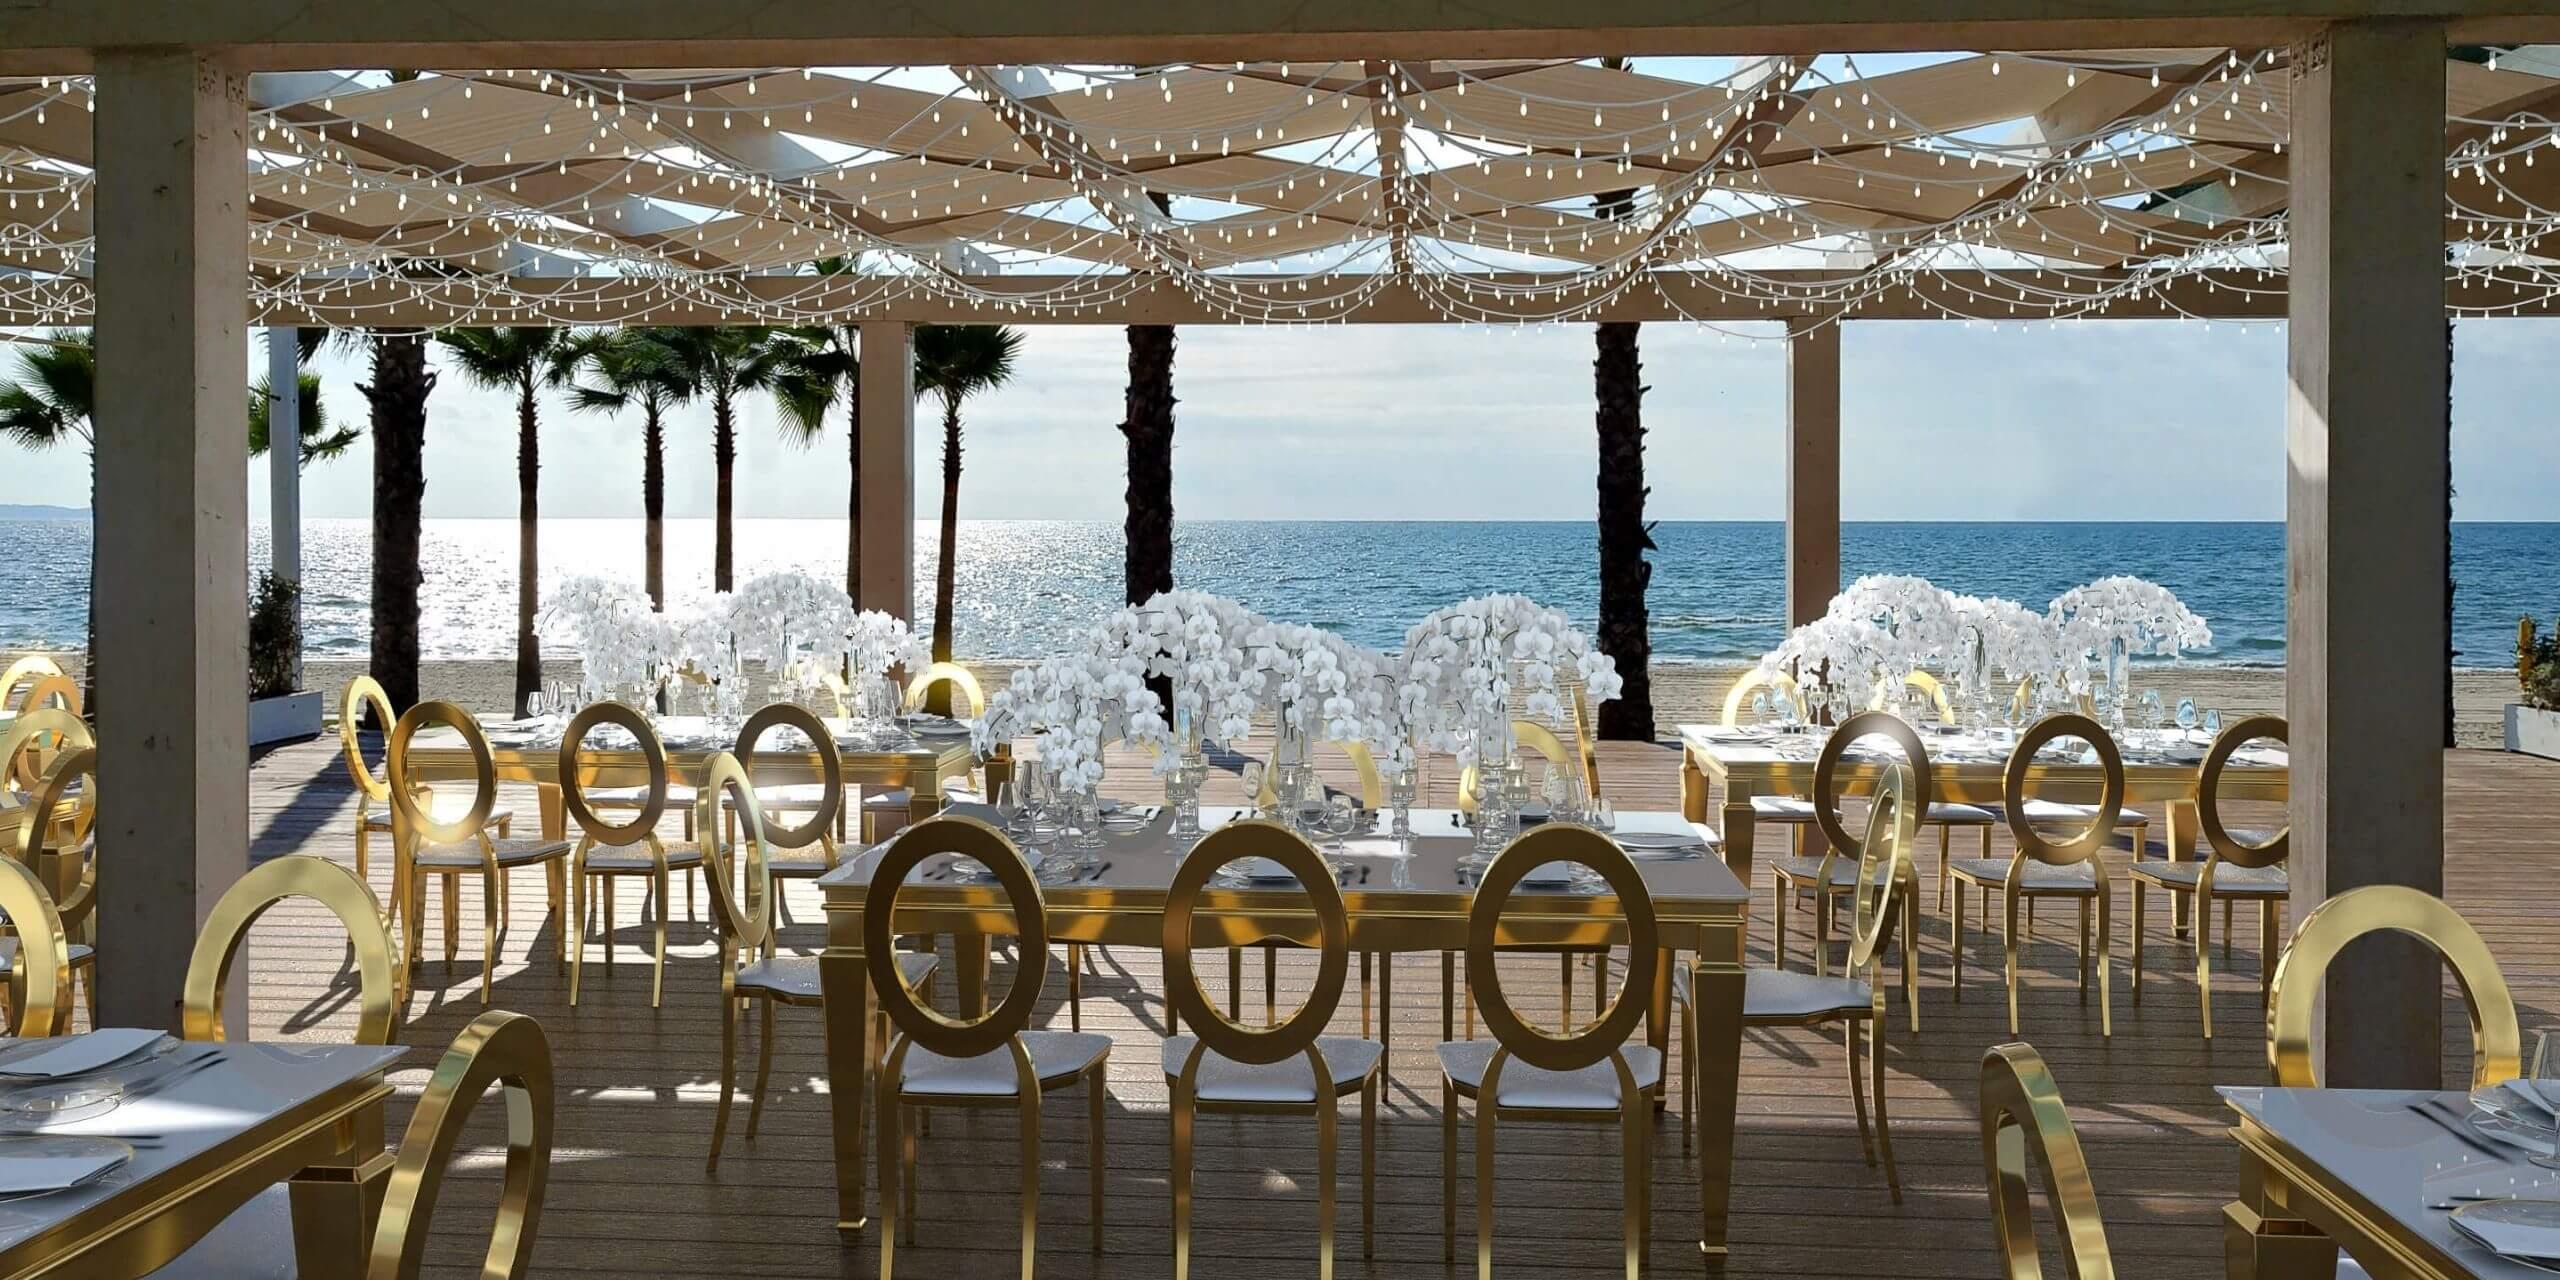 SARA-DANGELO-CORSI-WEDDING-EVENT-PLANNER-PHOTO-EDITING (1)